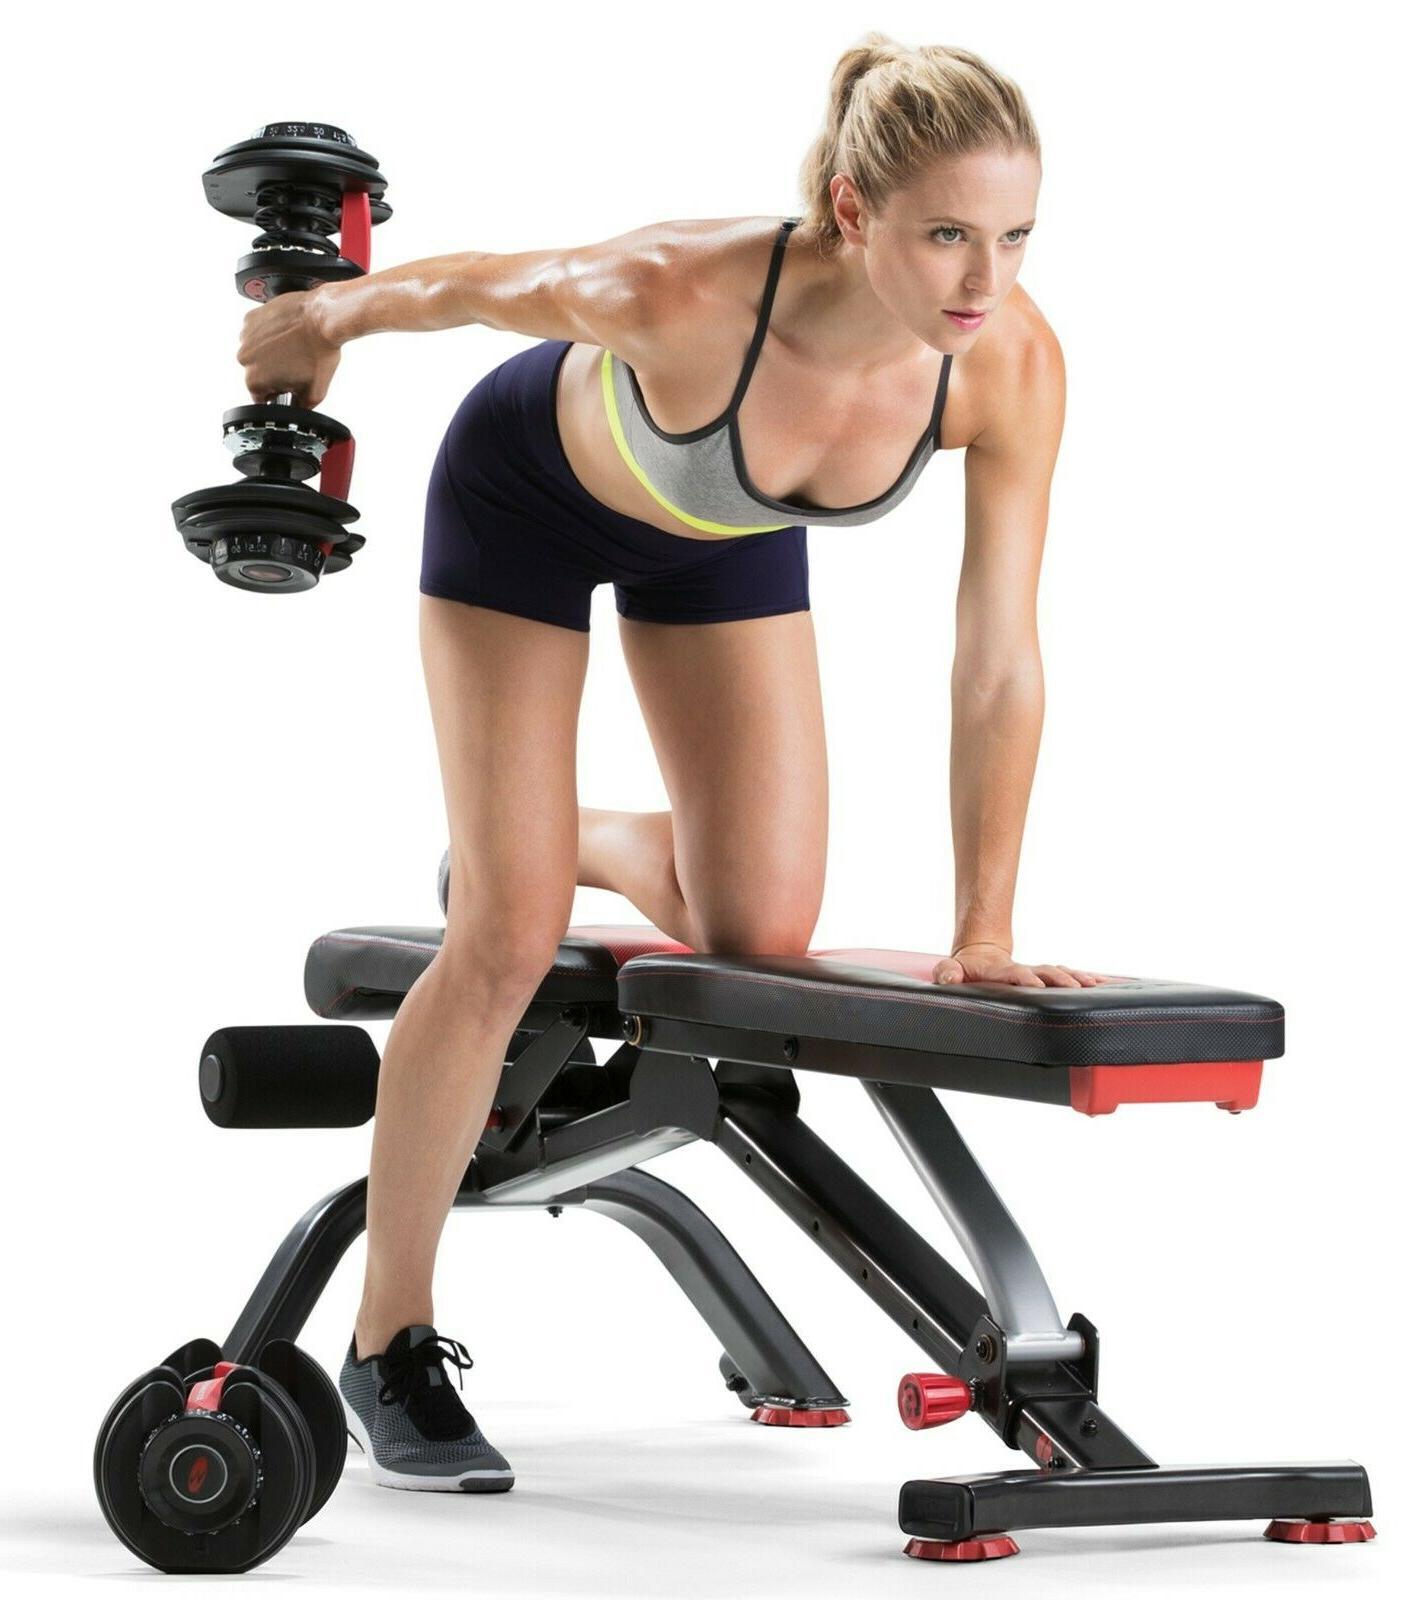 Bowflex Home Gym - + 5.1S Bench